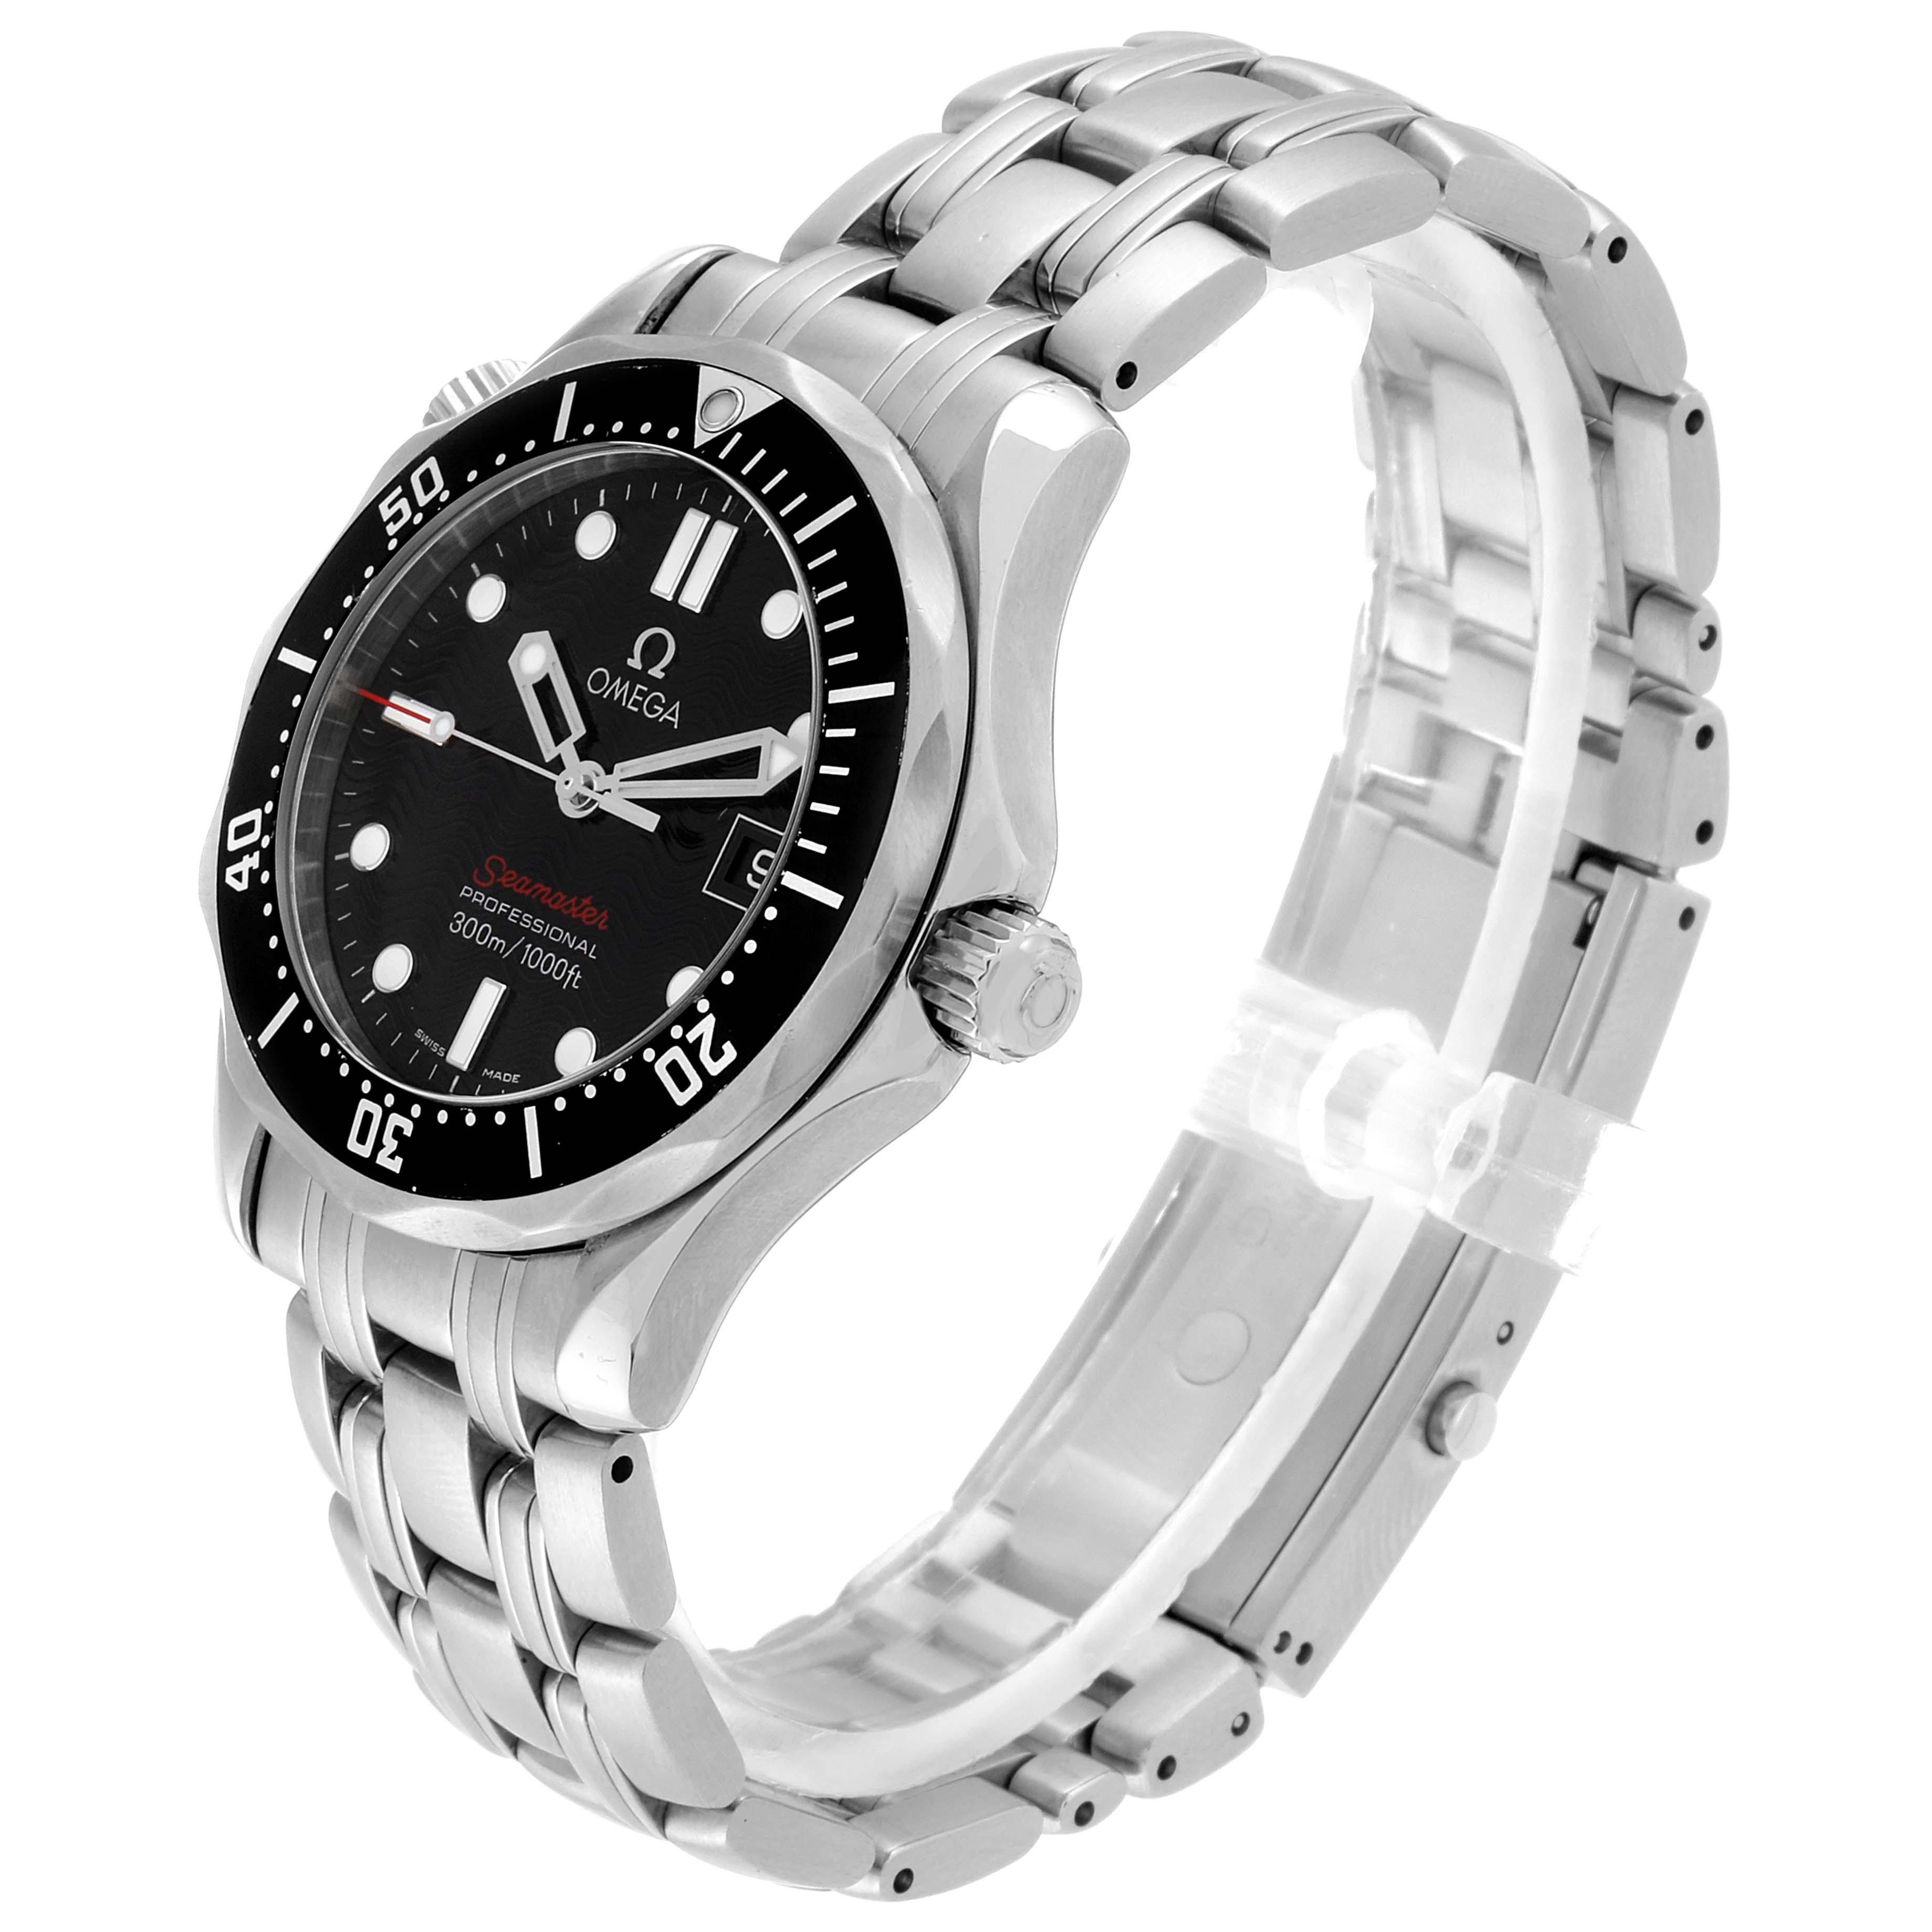 Omega Seamaster Diver 300m Midsize 36.25 mm Watch 212.30.36.61.01.001 SwissWatchExpo